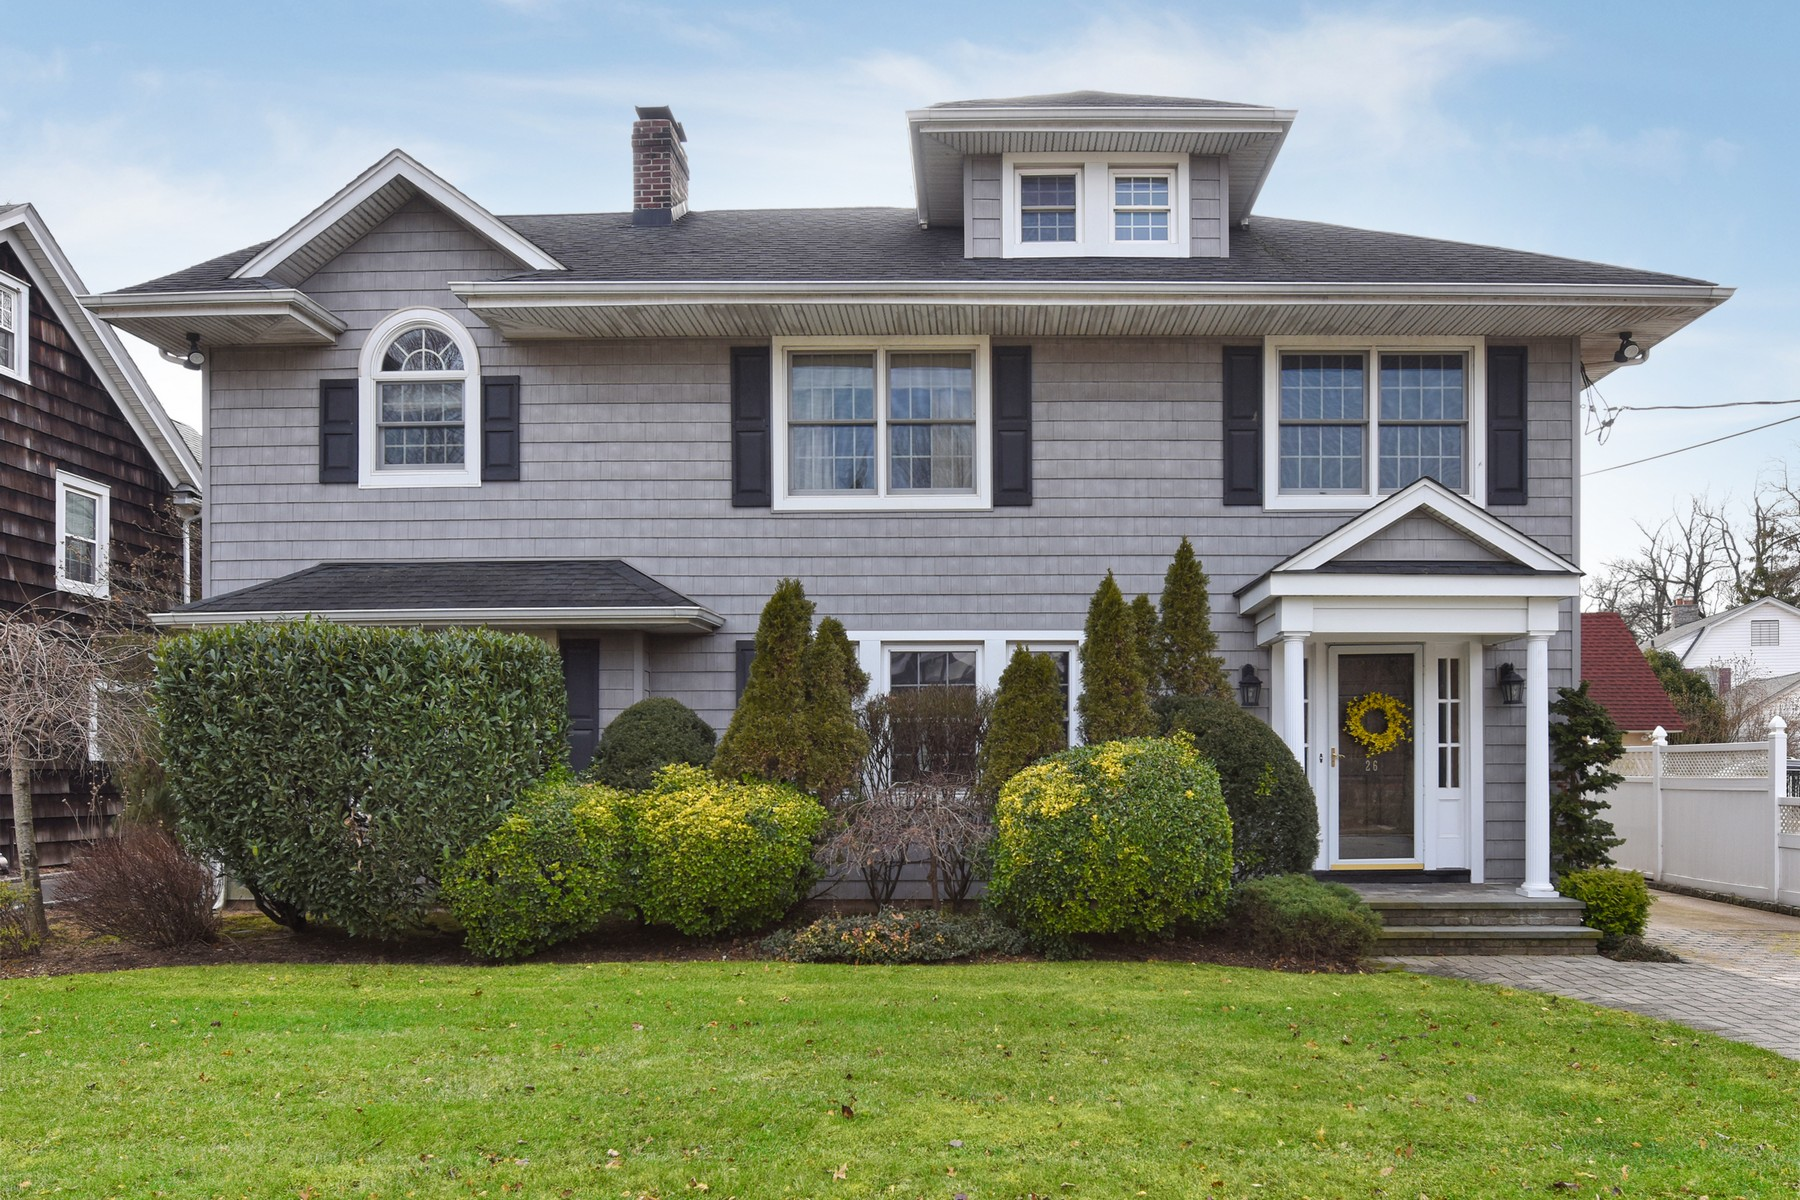 Single Family Homes for Active at Rockville Centre 26 Revere St Rockville Centre, New York 11570 United States